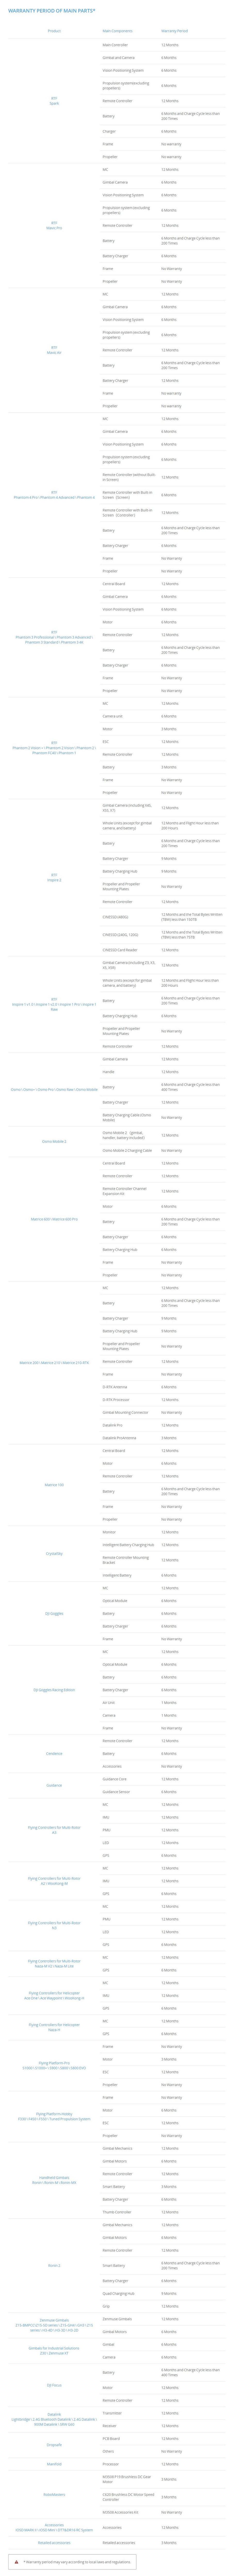 warrantyperiodofmainparts2018.jpg